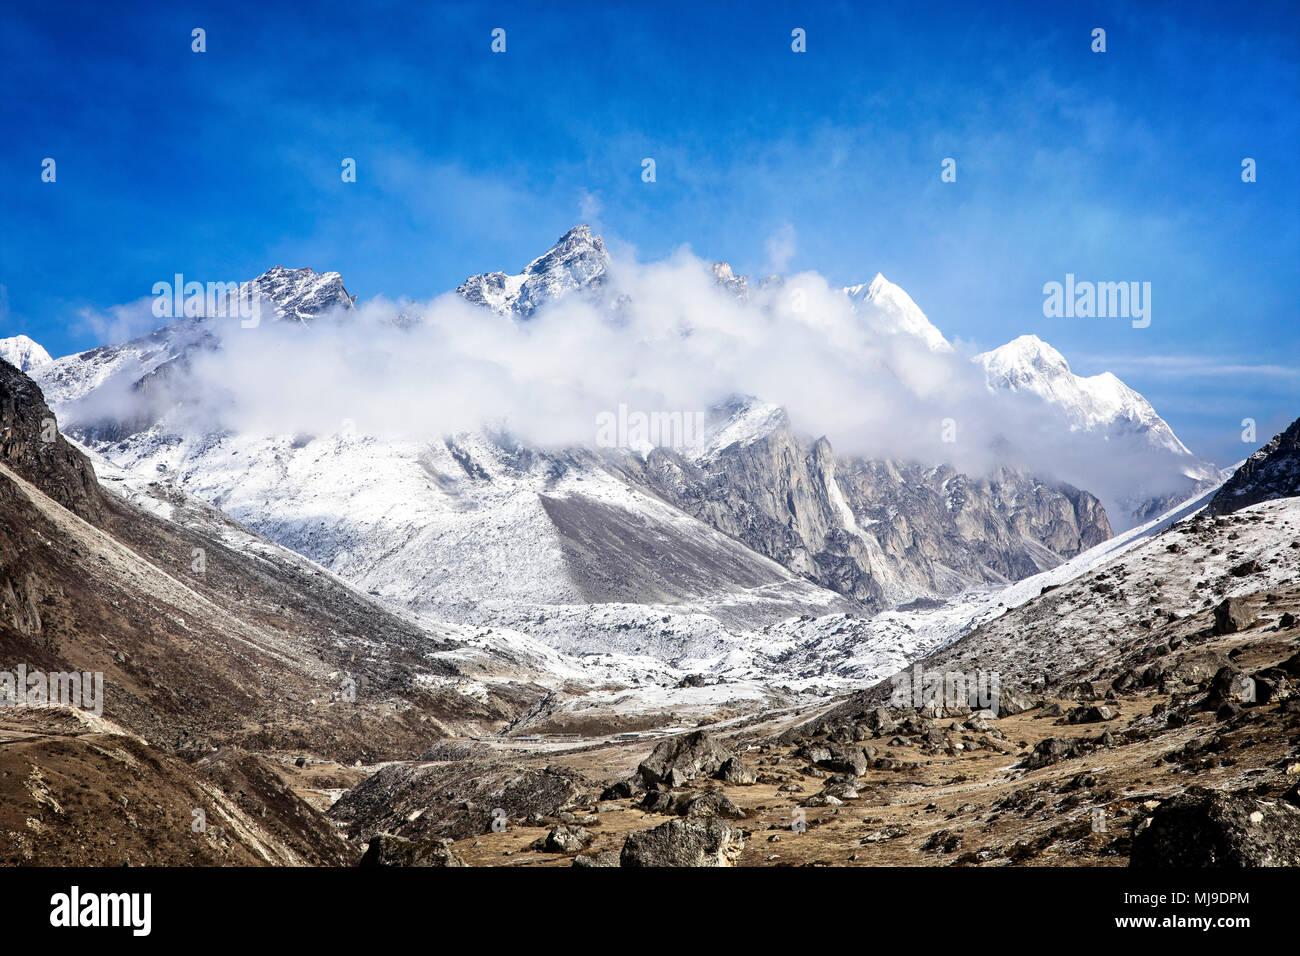 Dragkya Chhulung dominates the skyline near Lumde in Sagarmatha National Park, Nepal. - Stock Image